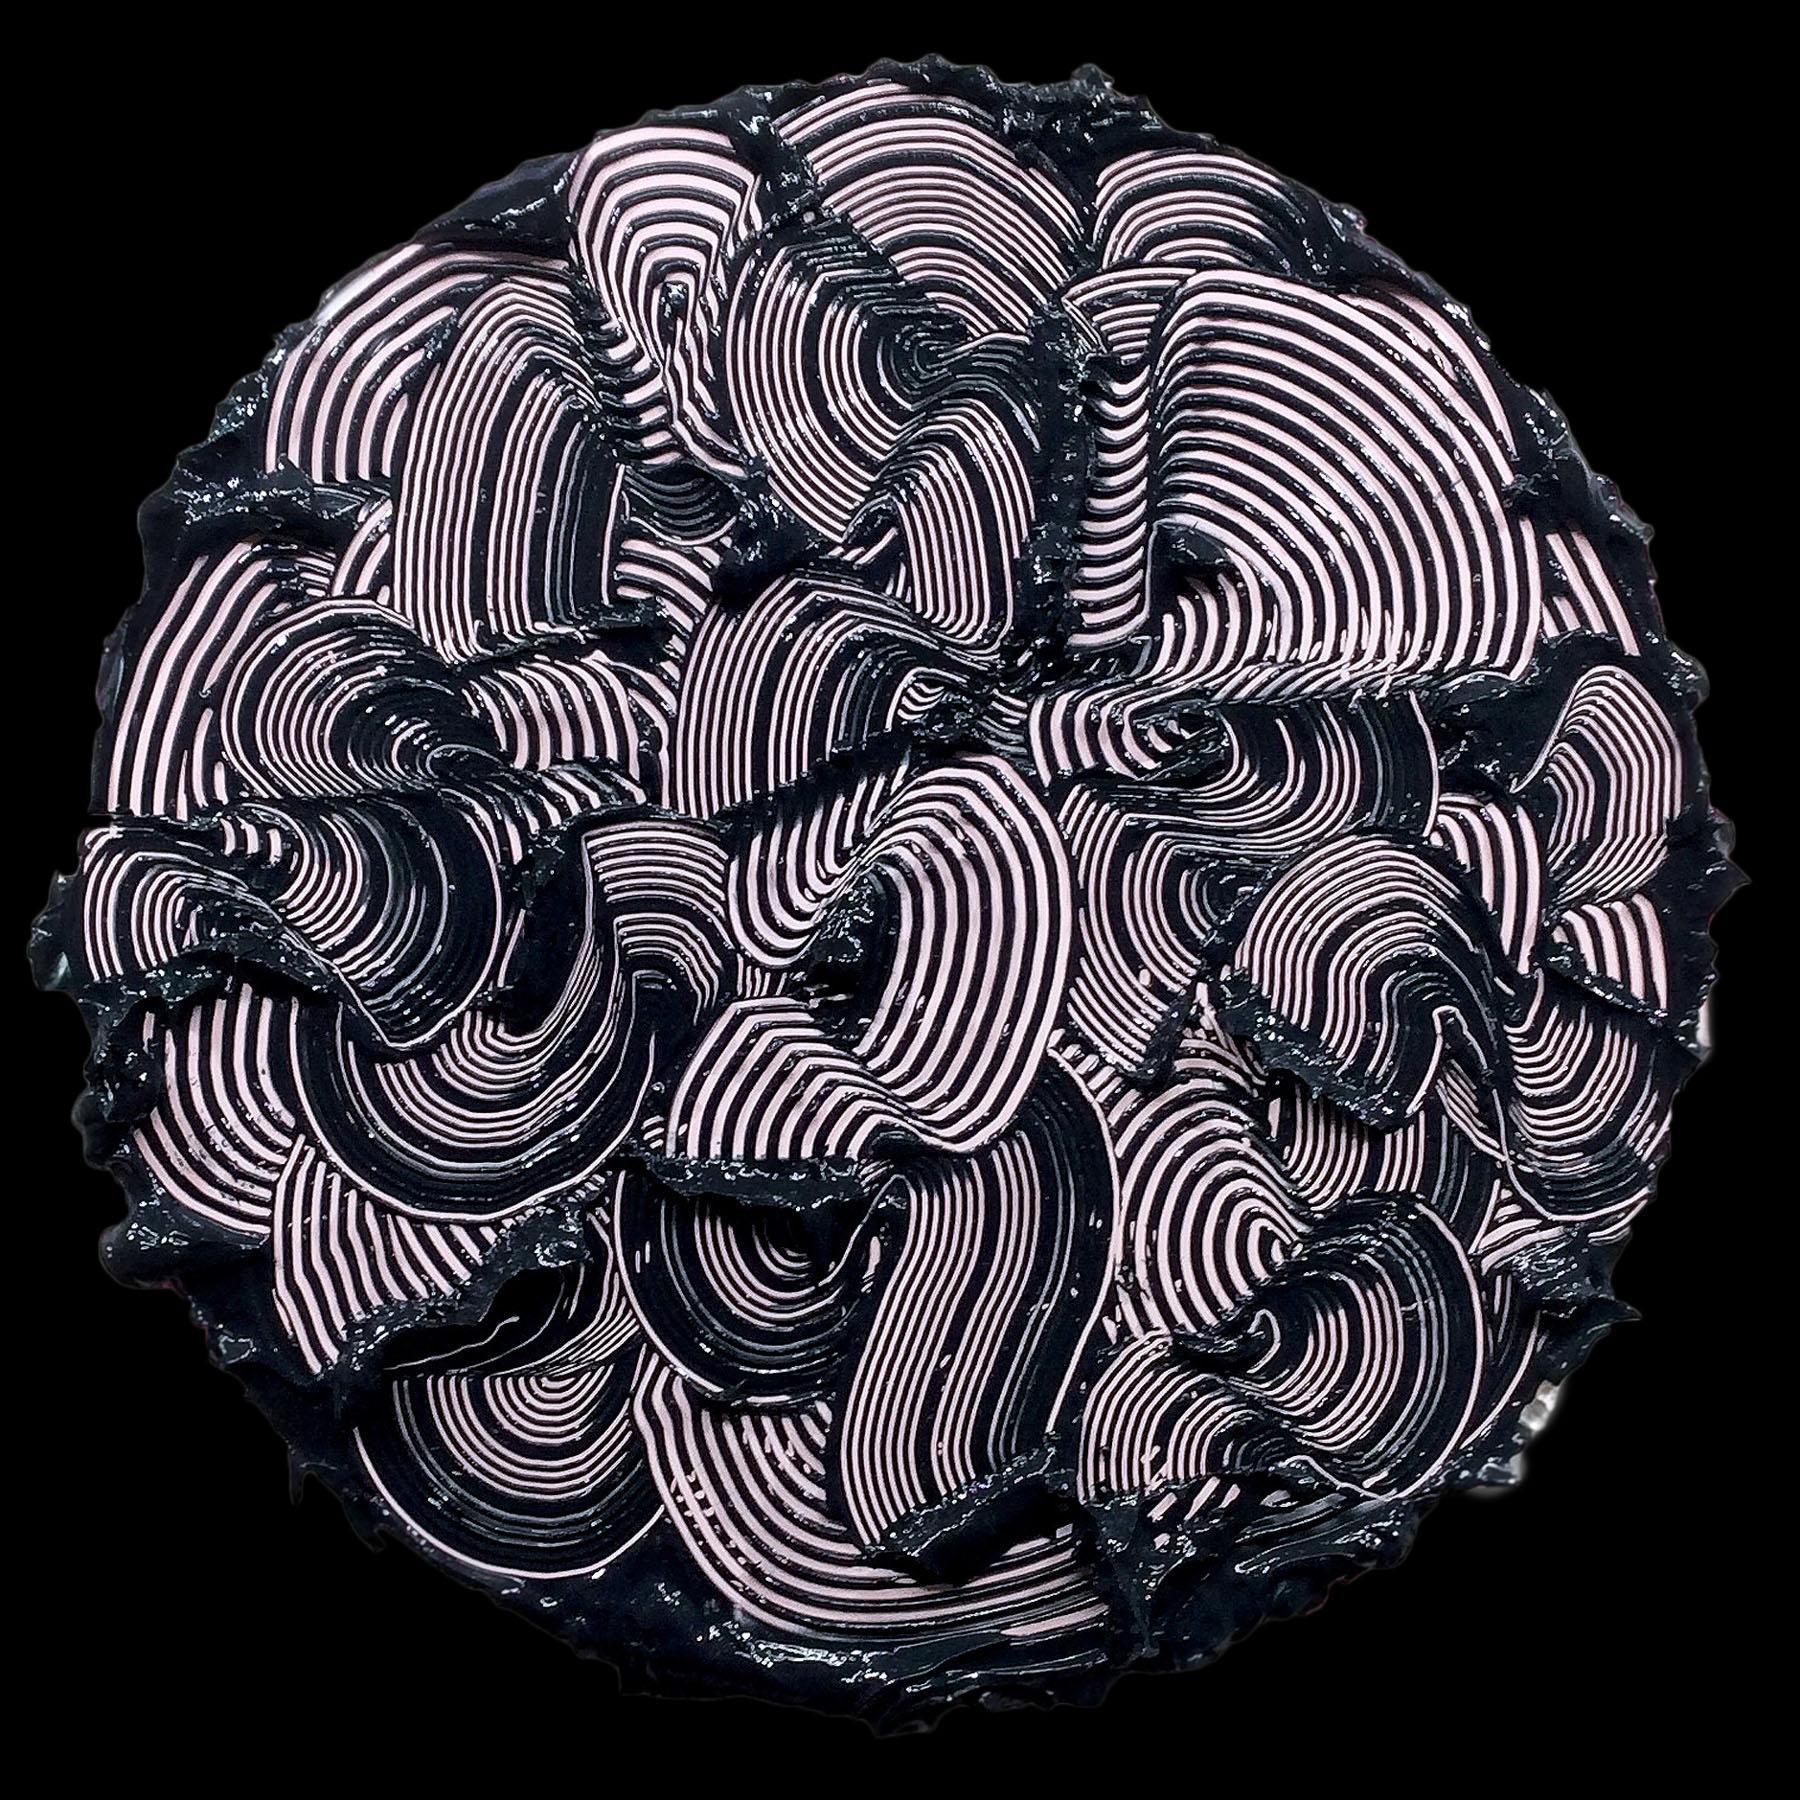 Tim-Nikiforuk---Medusa_black bg test.jpg